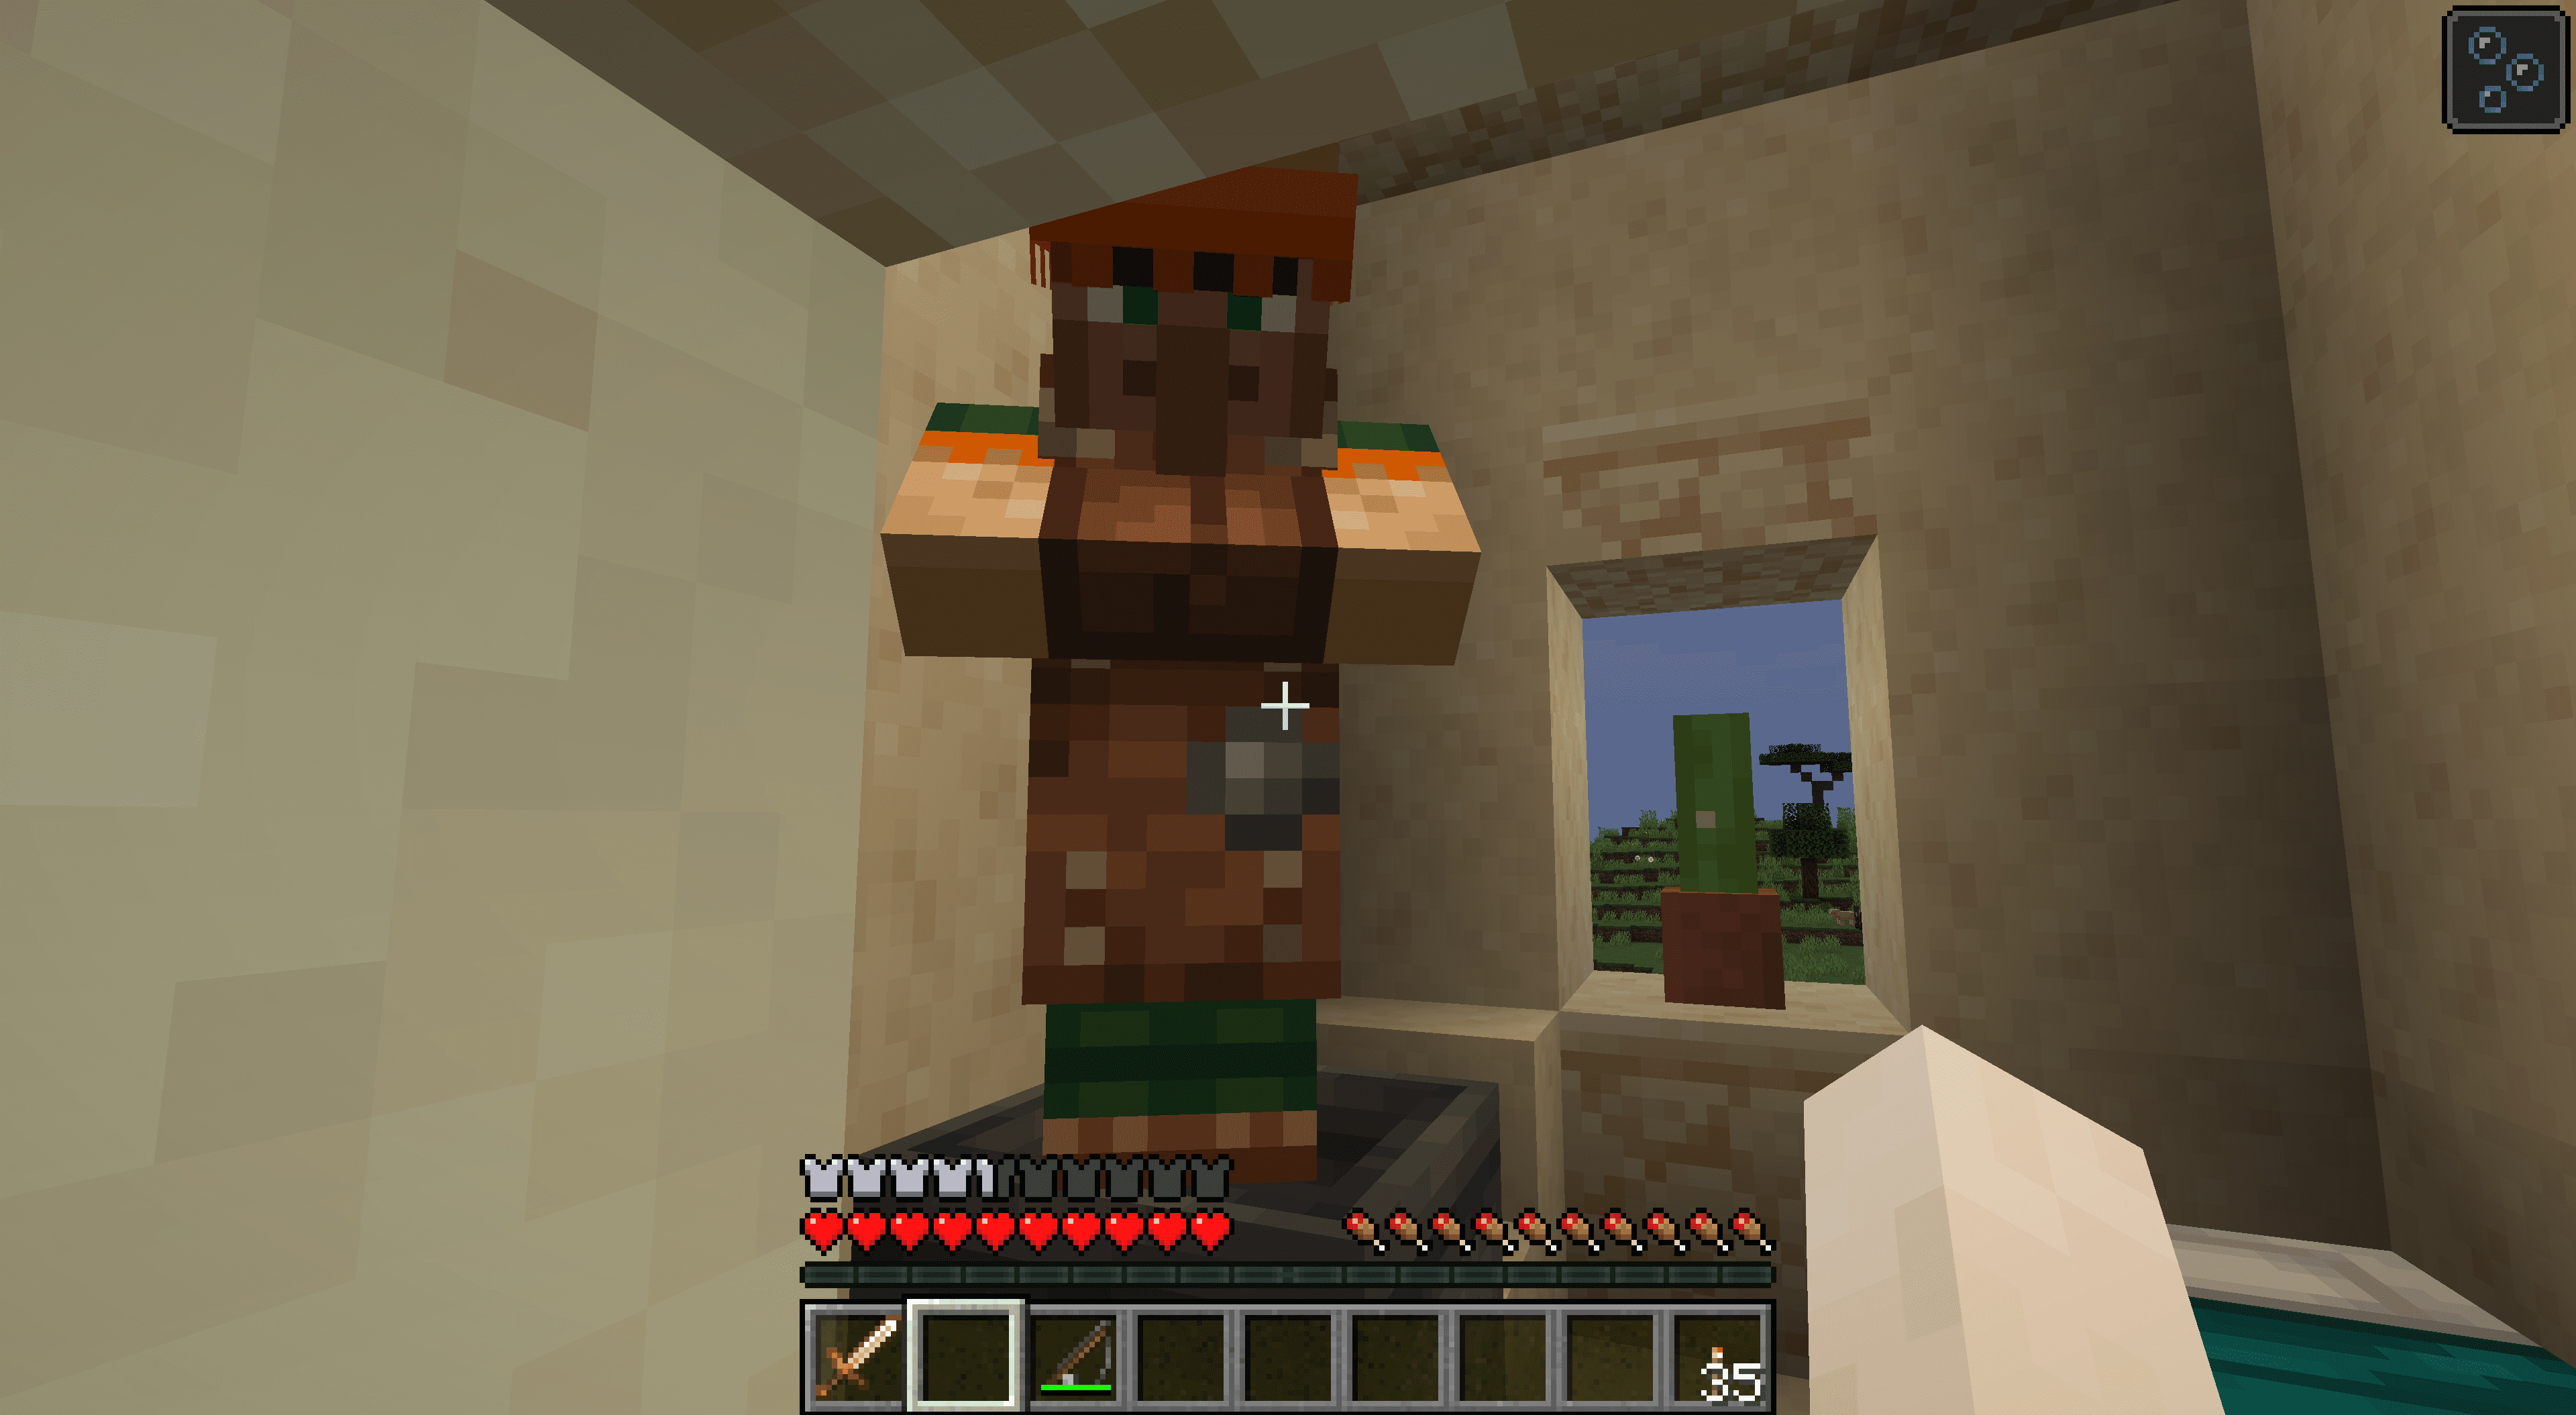 A leatherworker in Minecraft.